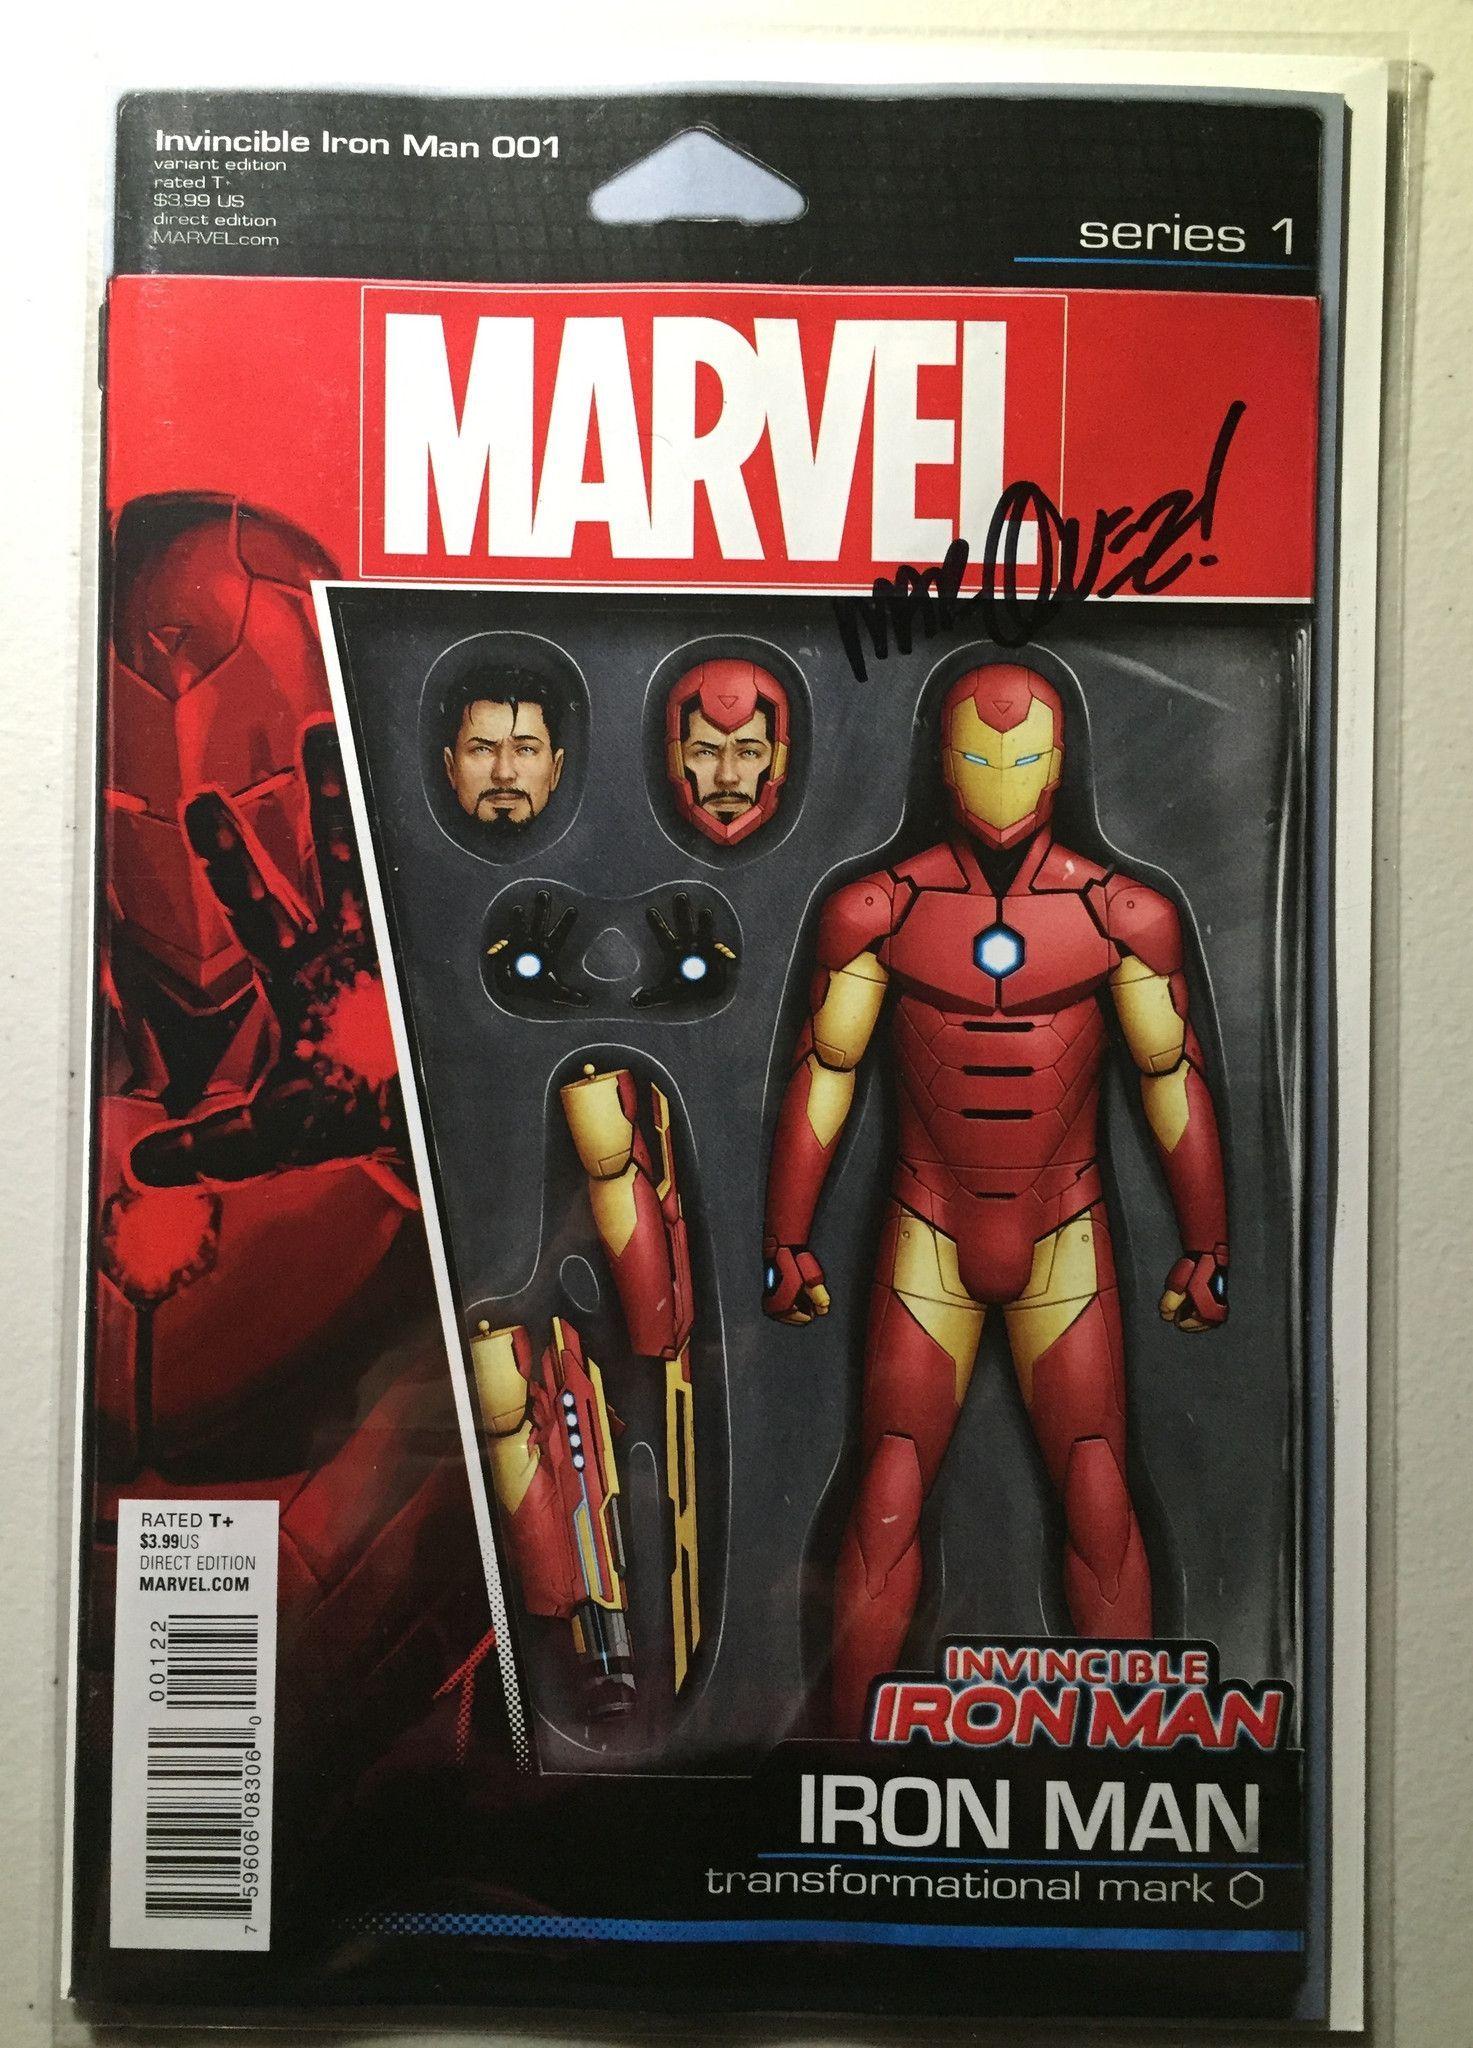 Ii15 Invincible Iron Man 1 Jtc Action Figure Variant Marvel Action Figures Iron Man Iron Man Action Figures